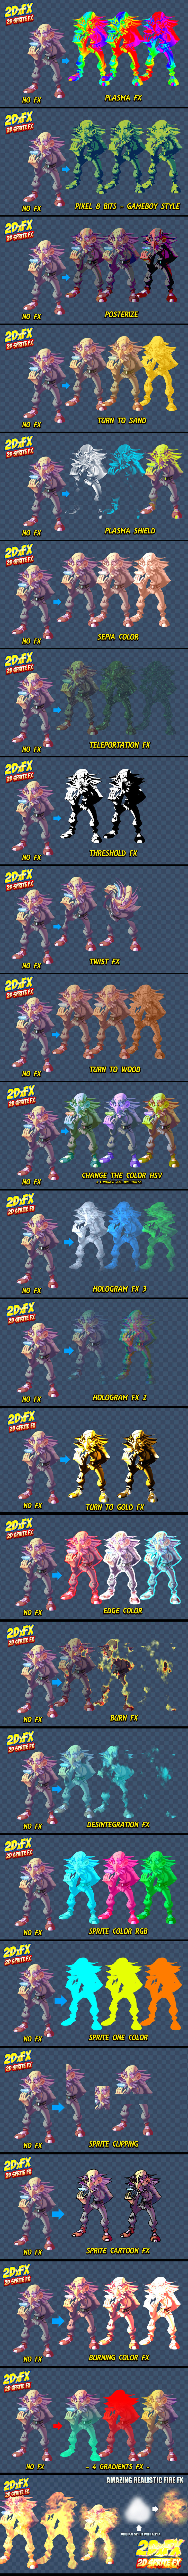 2DxFX: 2D Sprite FX 2DxFX is an advanced 2D Sprite Tool  Create